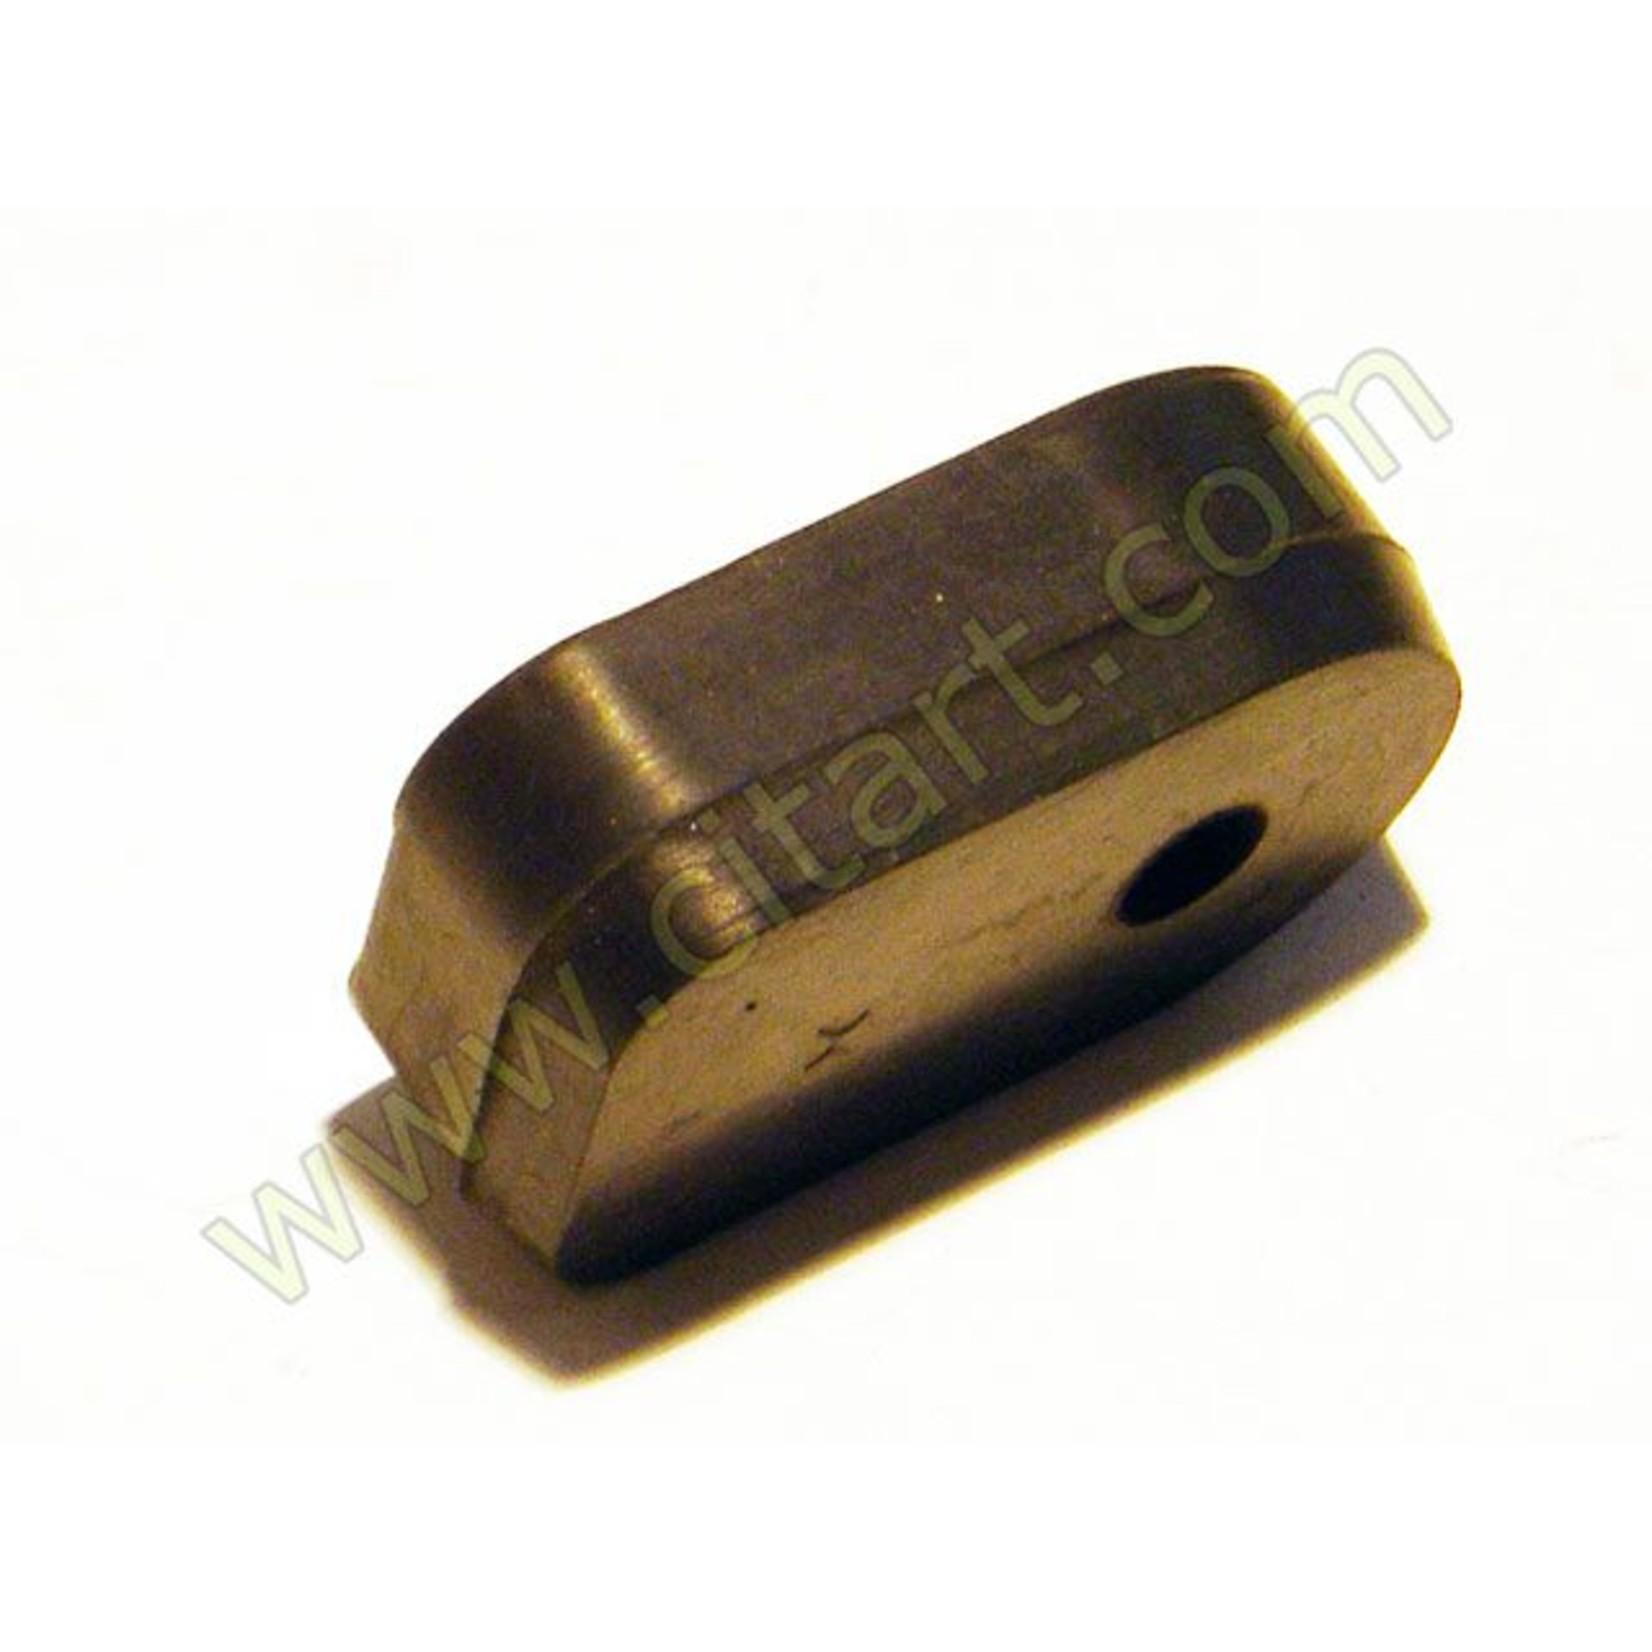 Tacos elástico radiador 66- Nr Org: DX23296